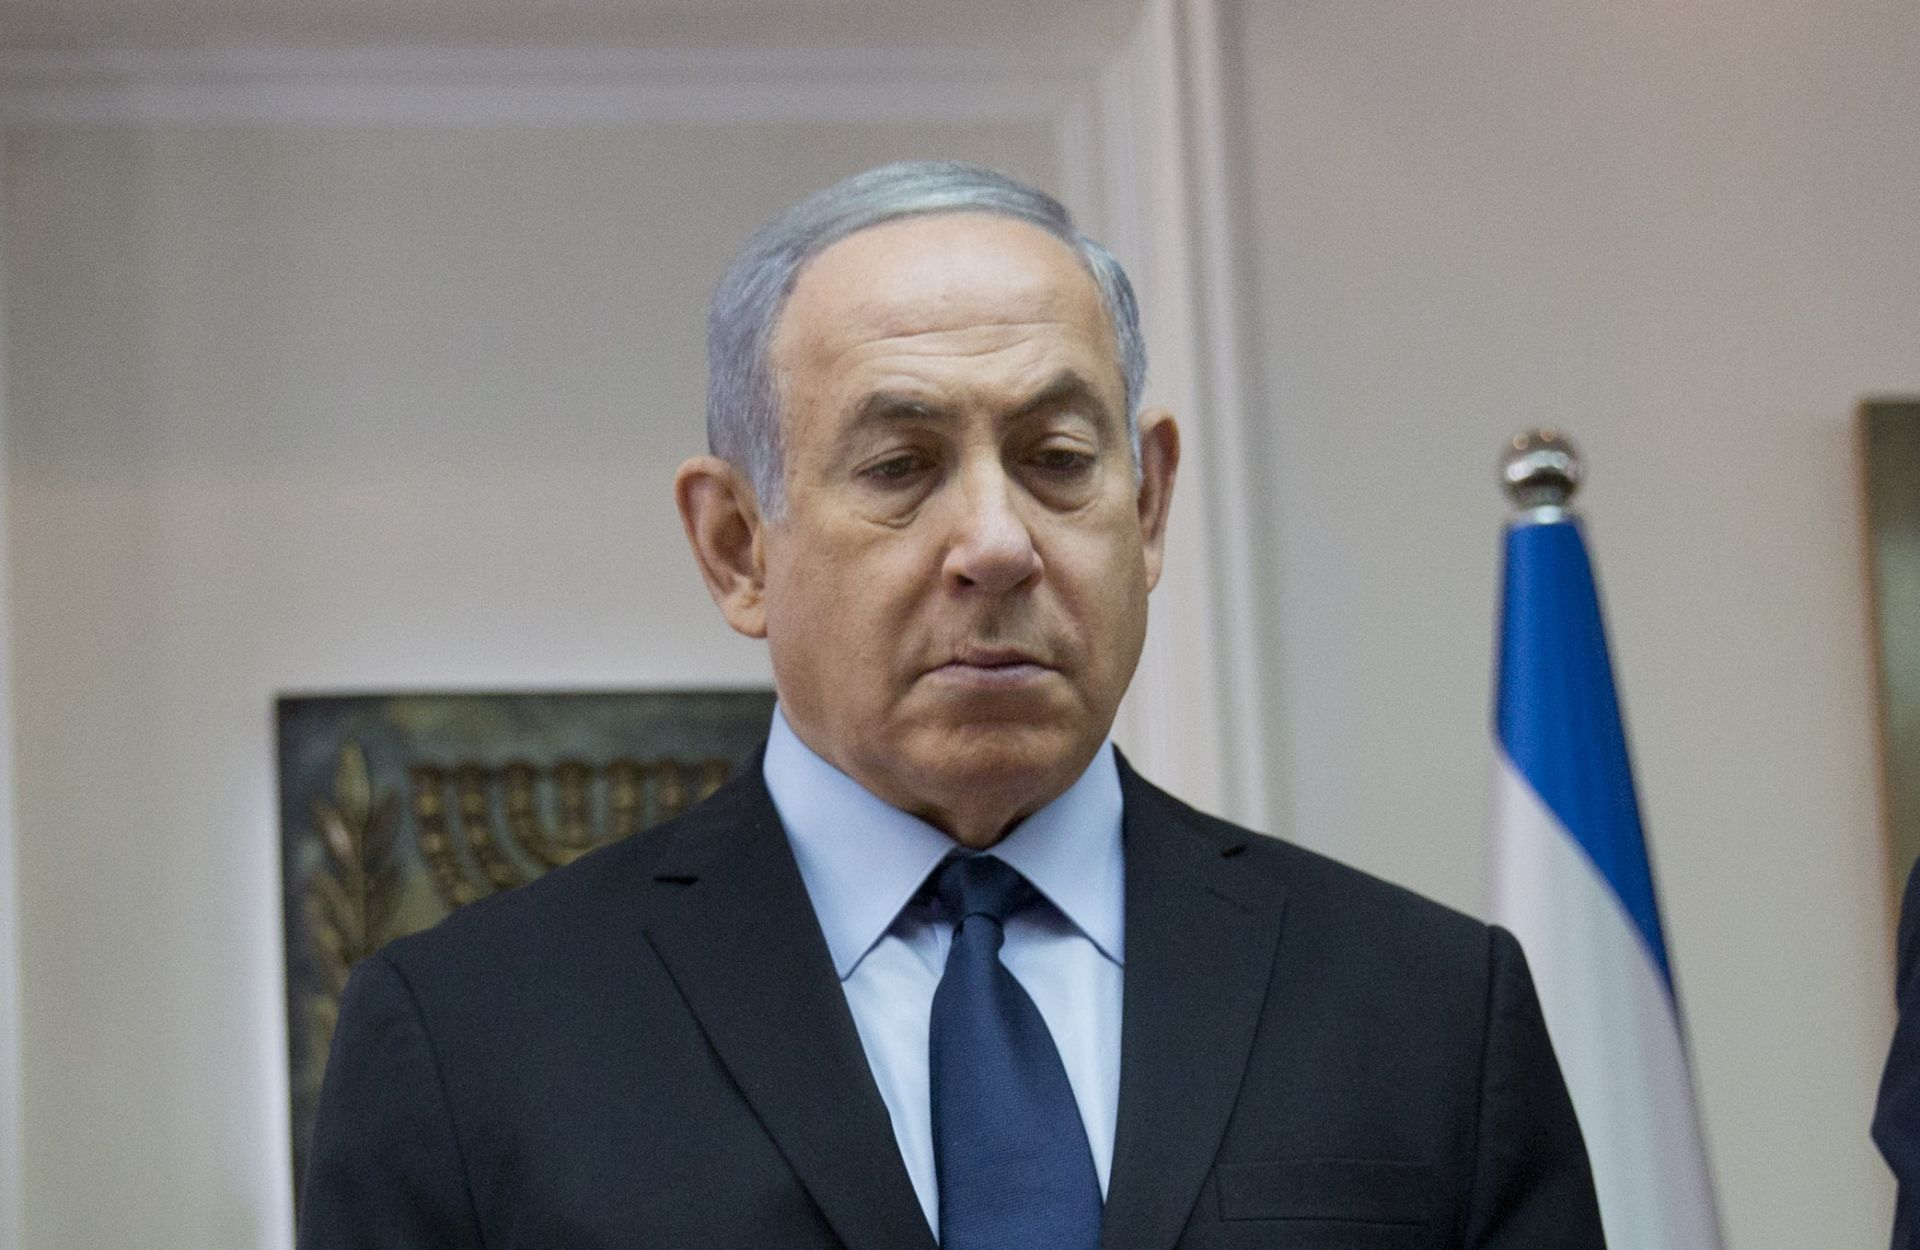 Netanyahu otkazao posjet Austriji usred krize vlade